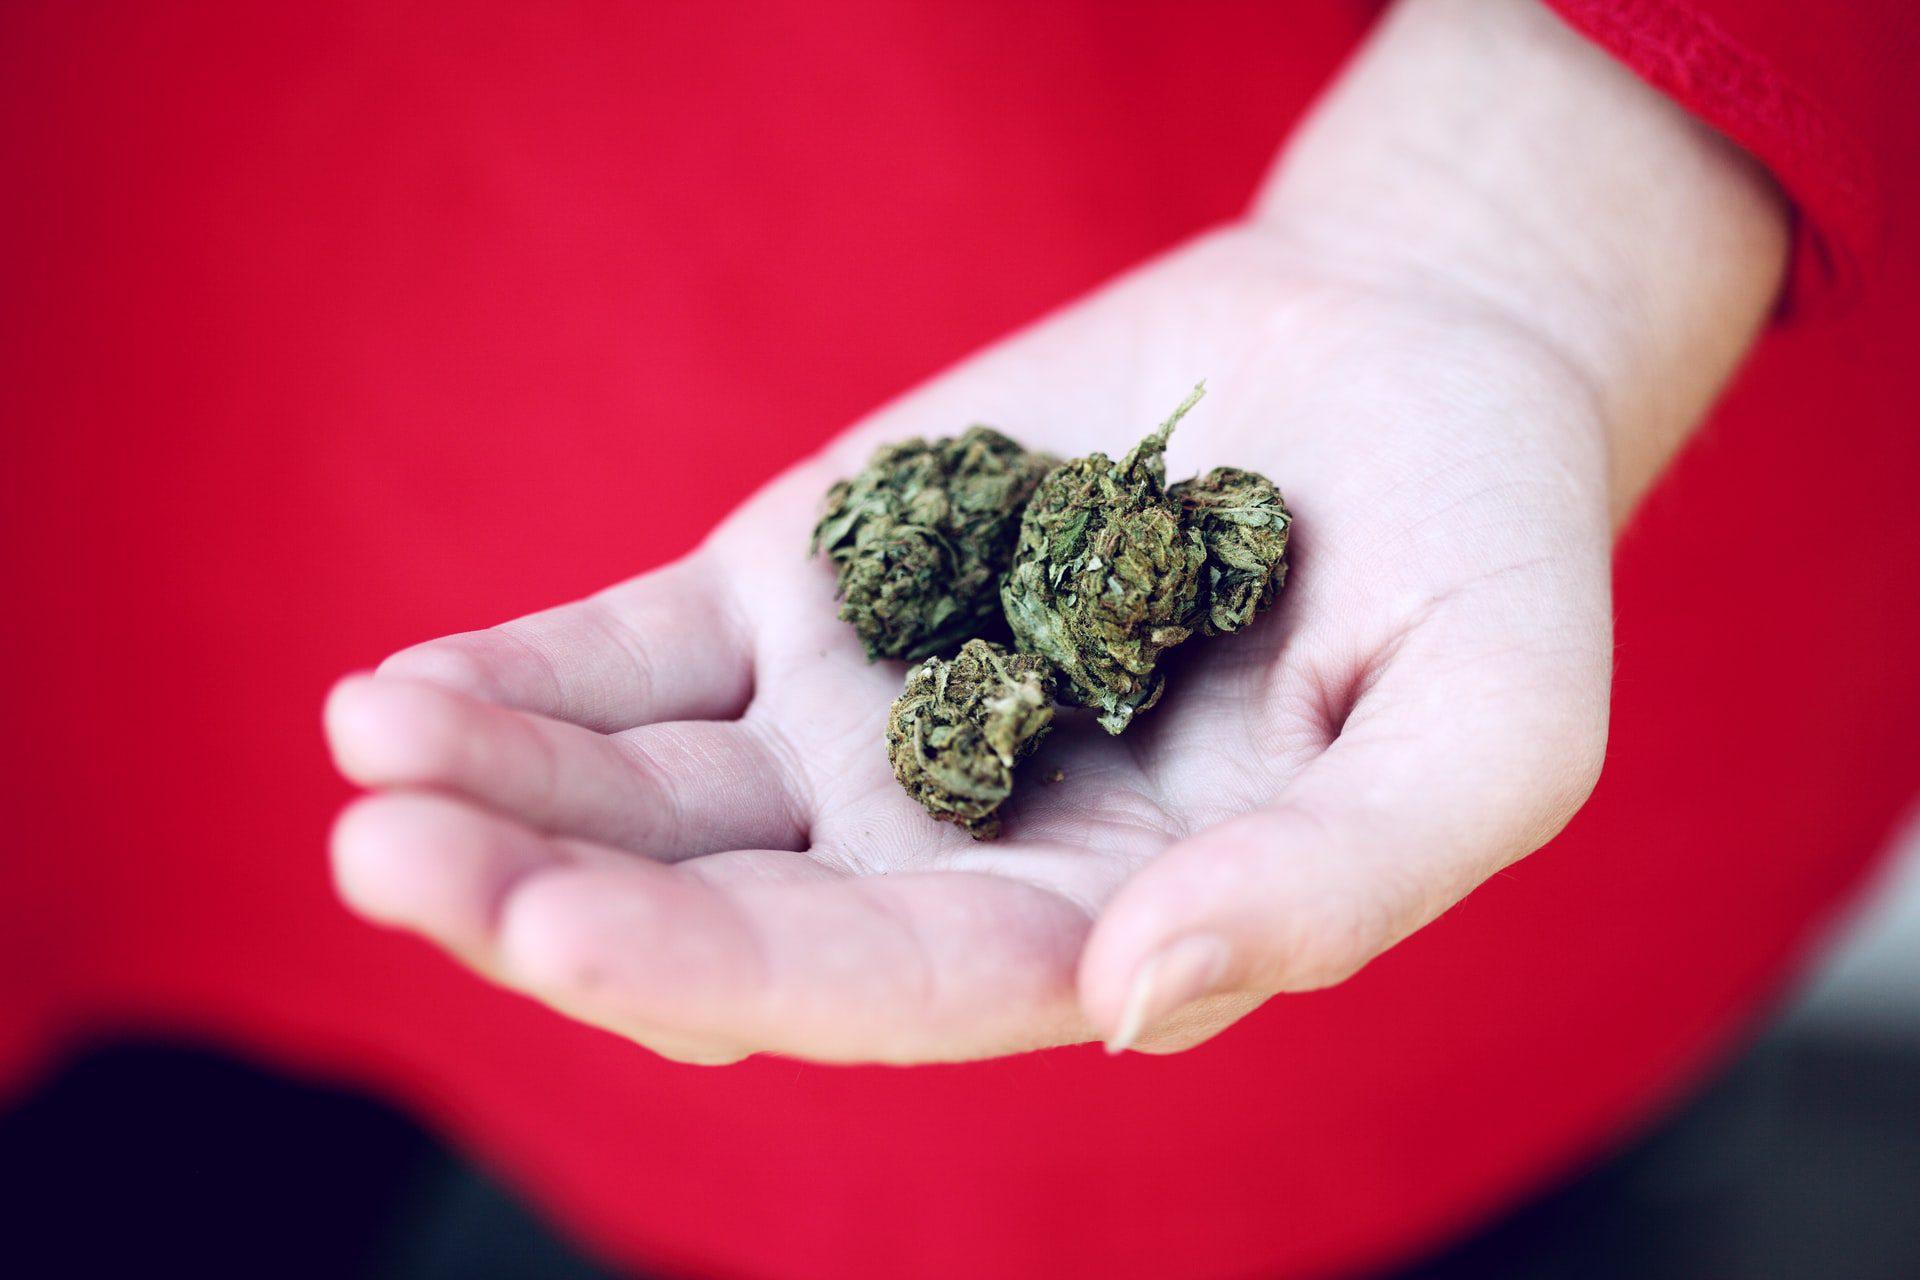 Medical Marijuana Is Coming to Putnam County, West Virginia